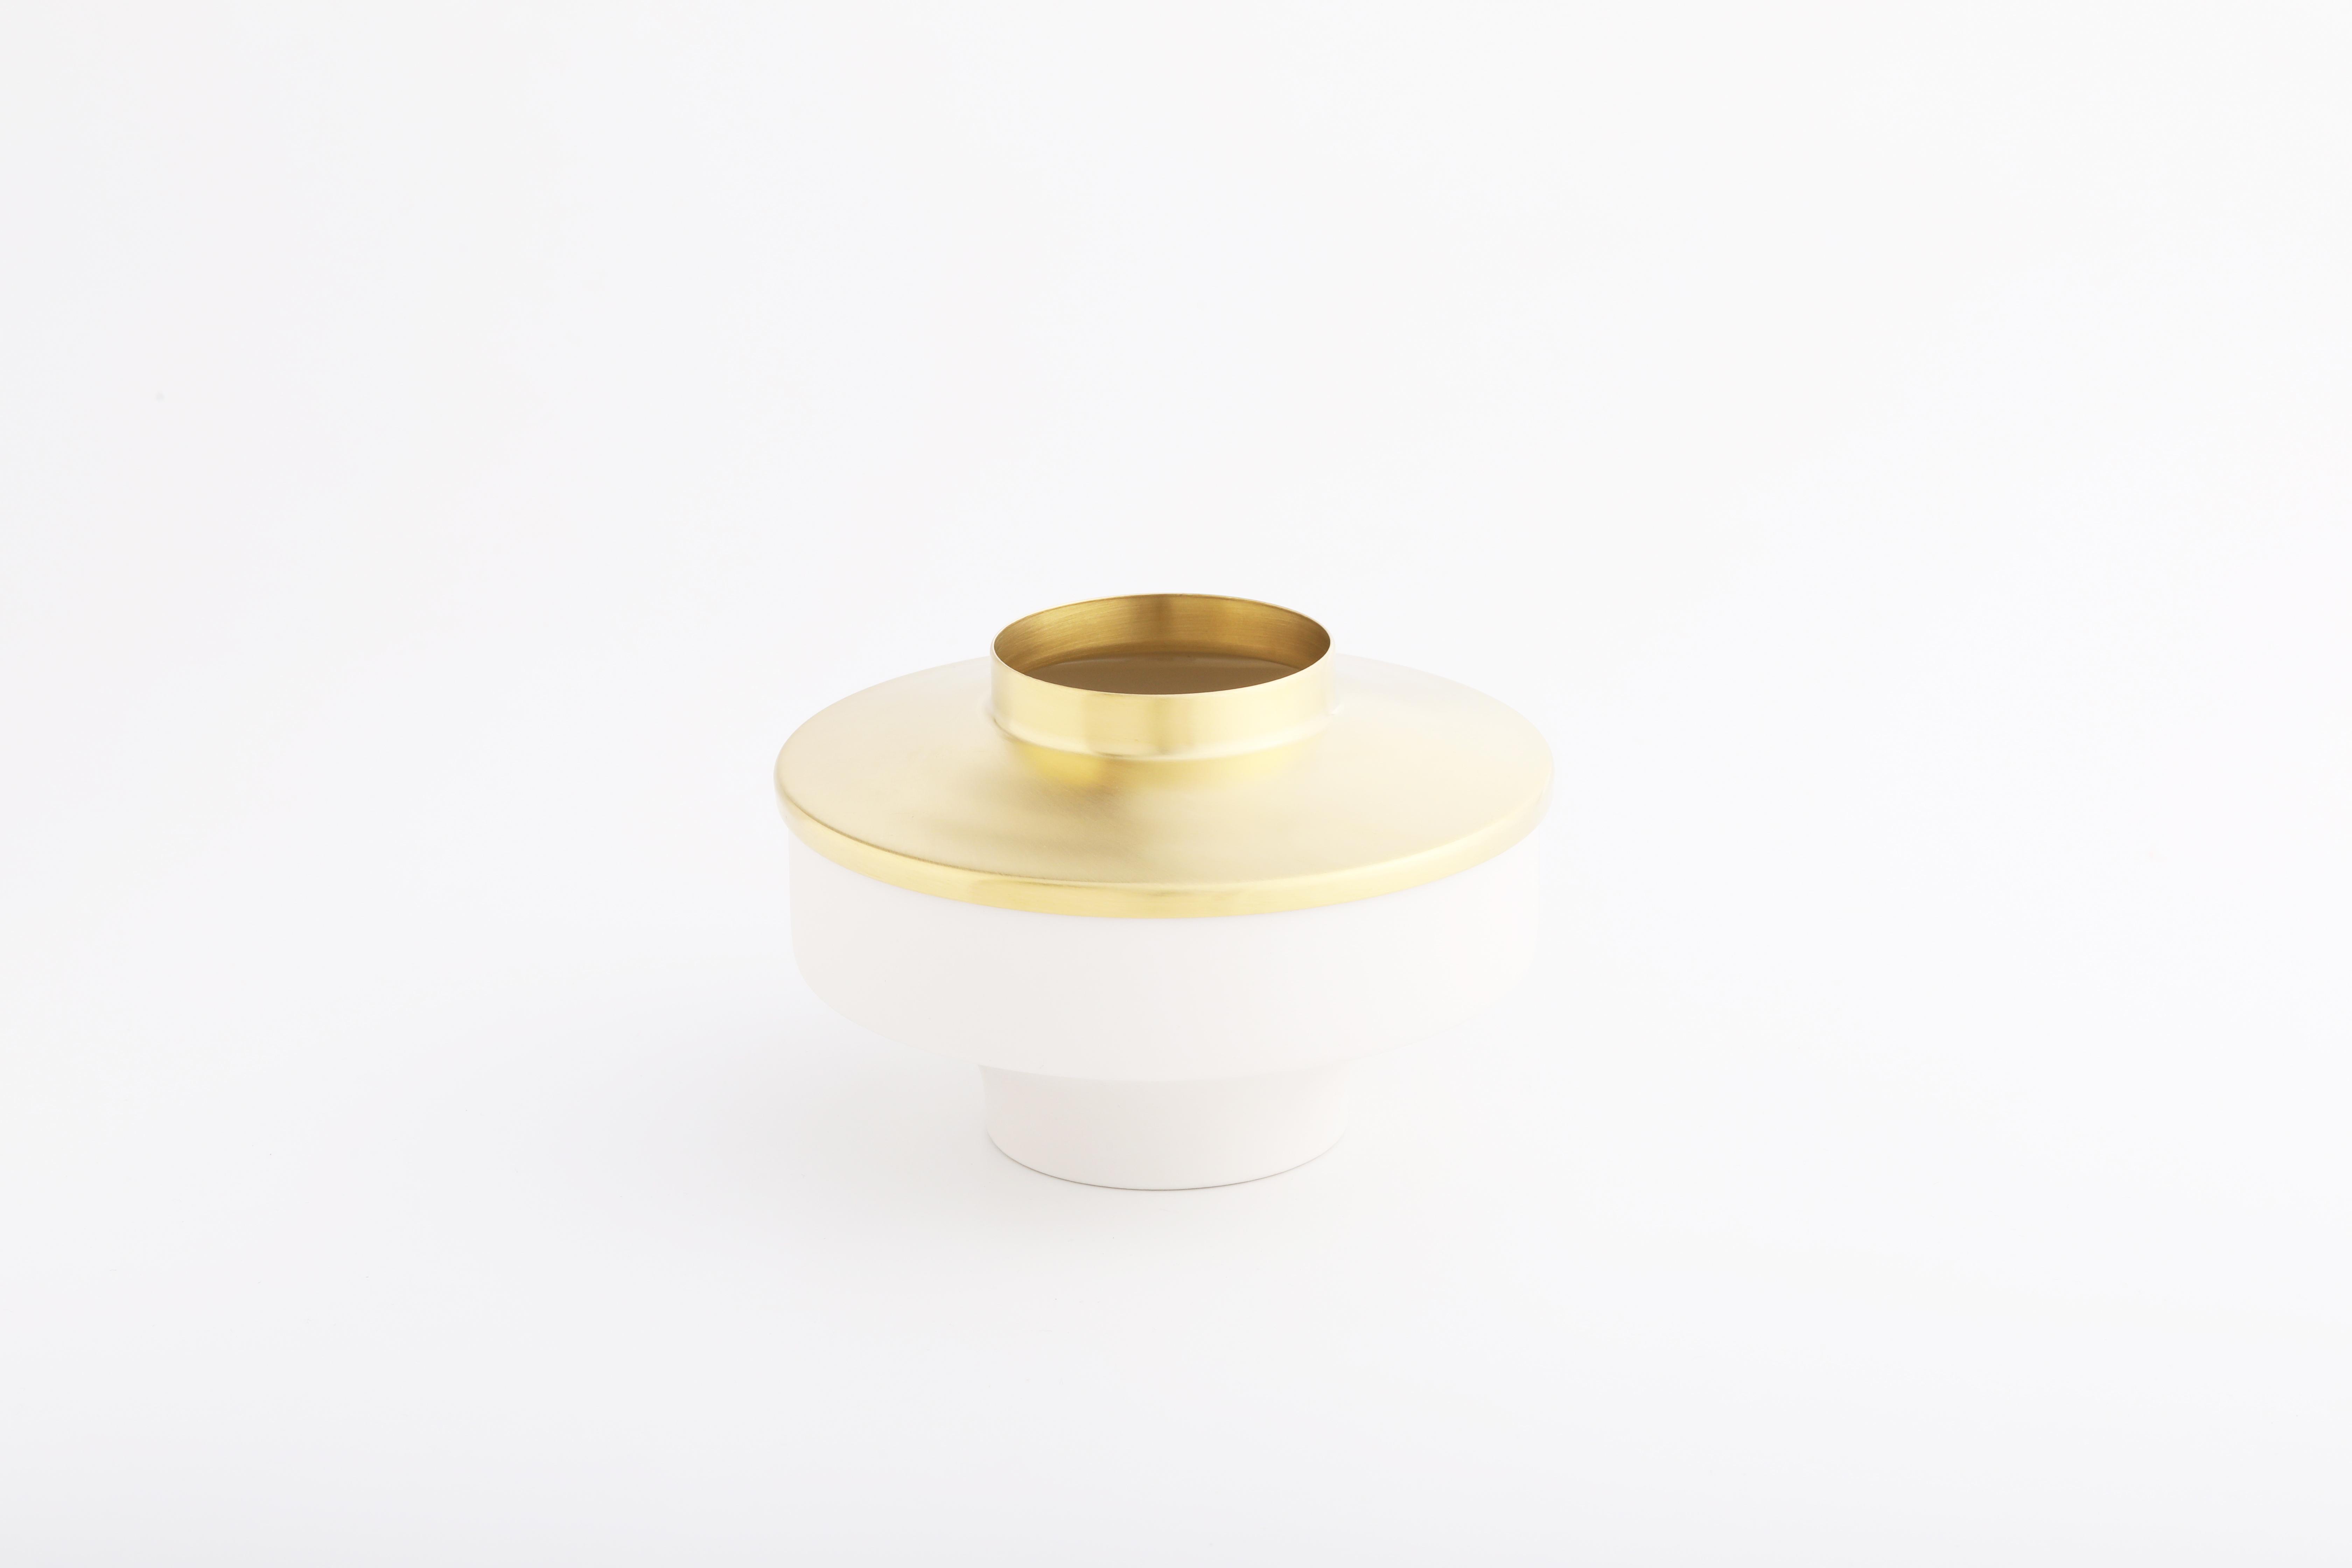 Set 6 (白瓷黃銅款 / White,Brass)